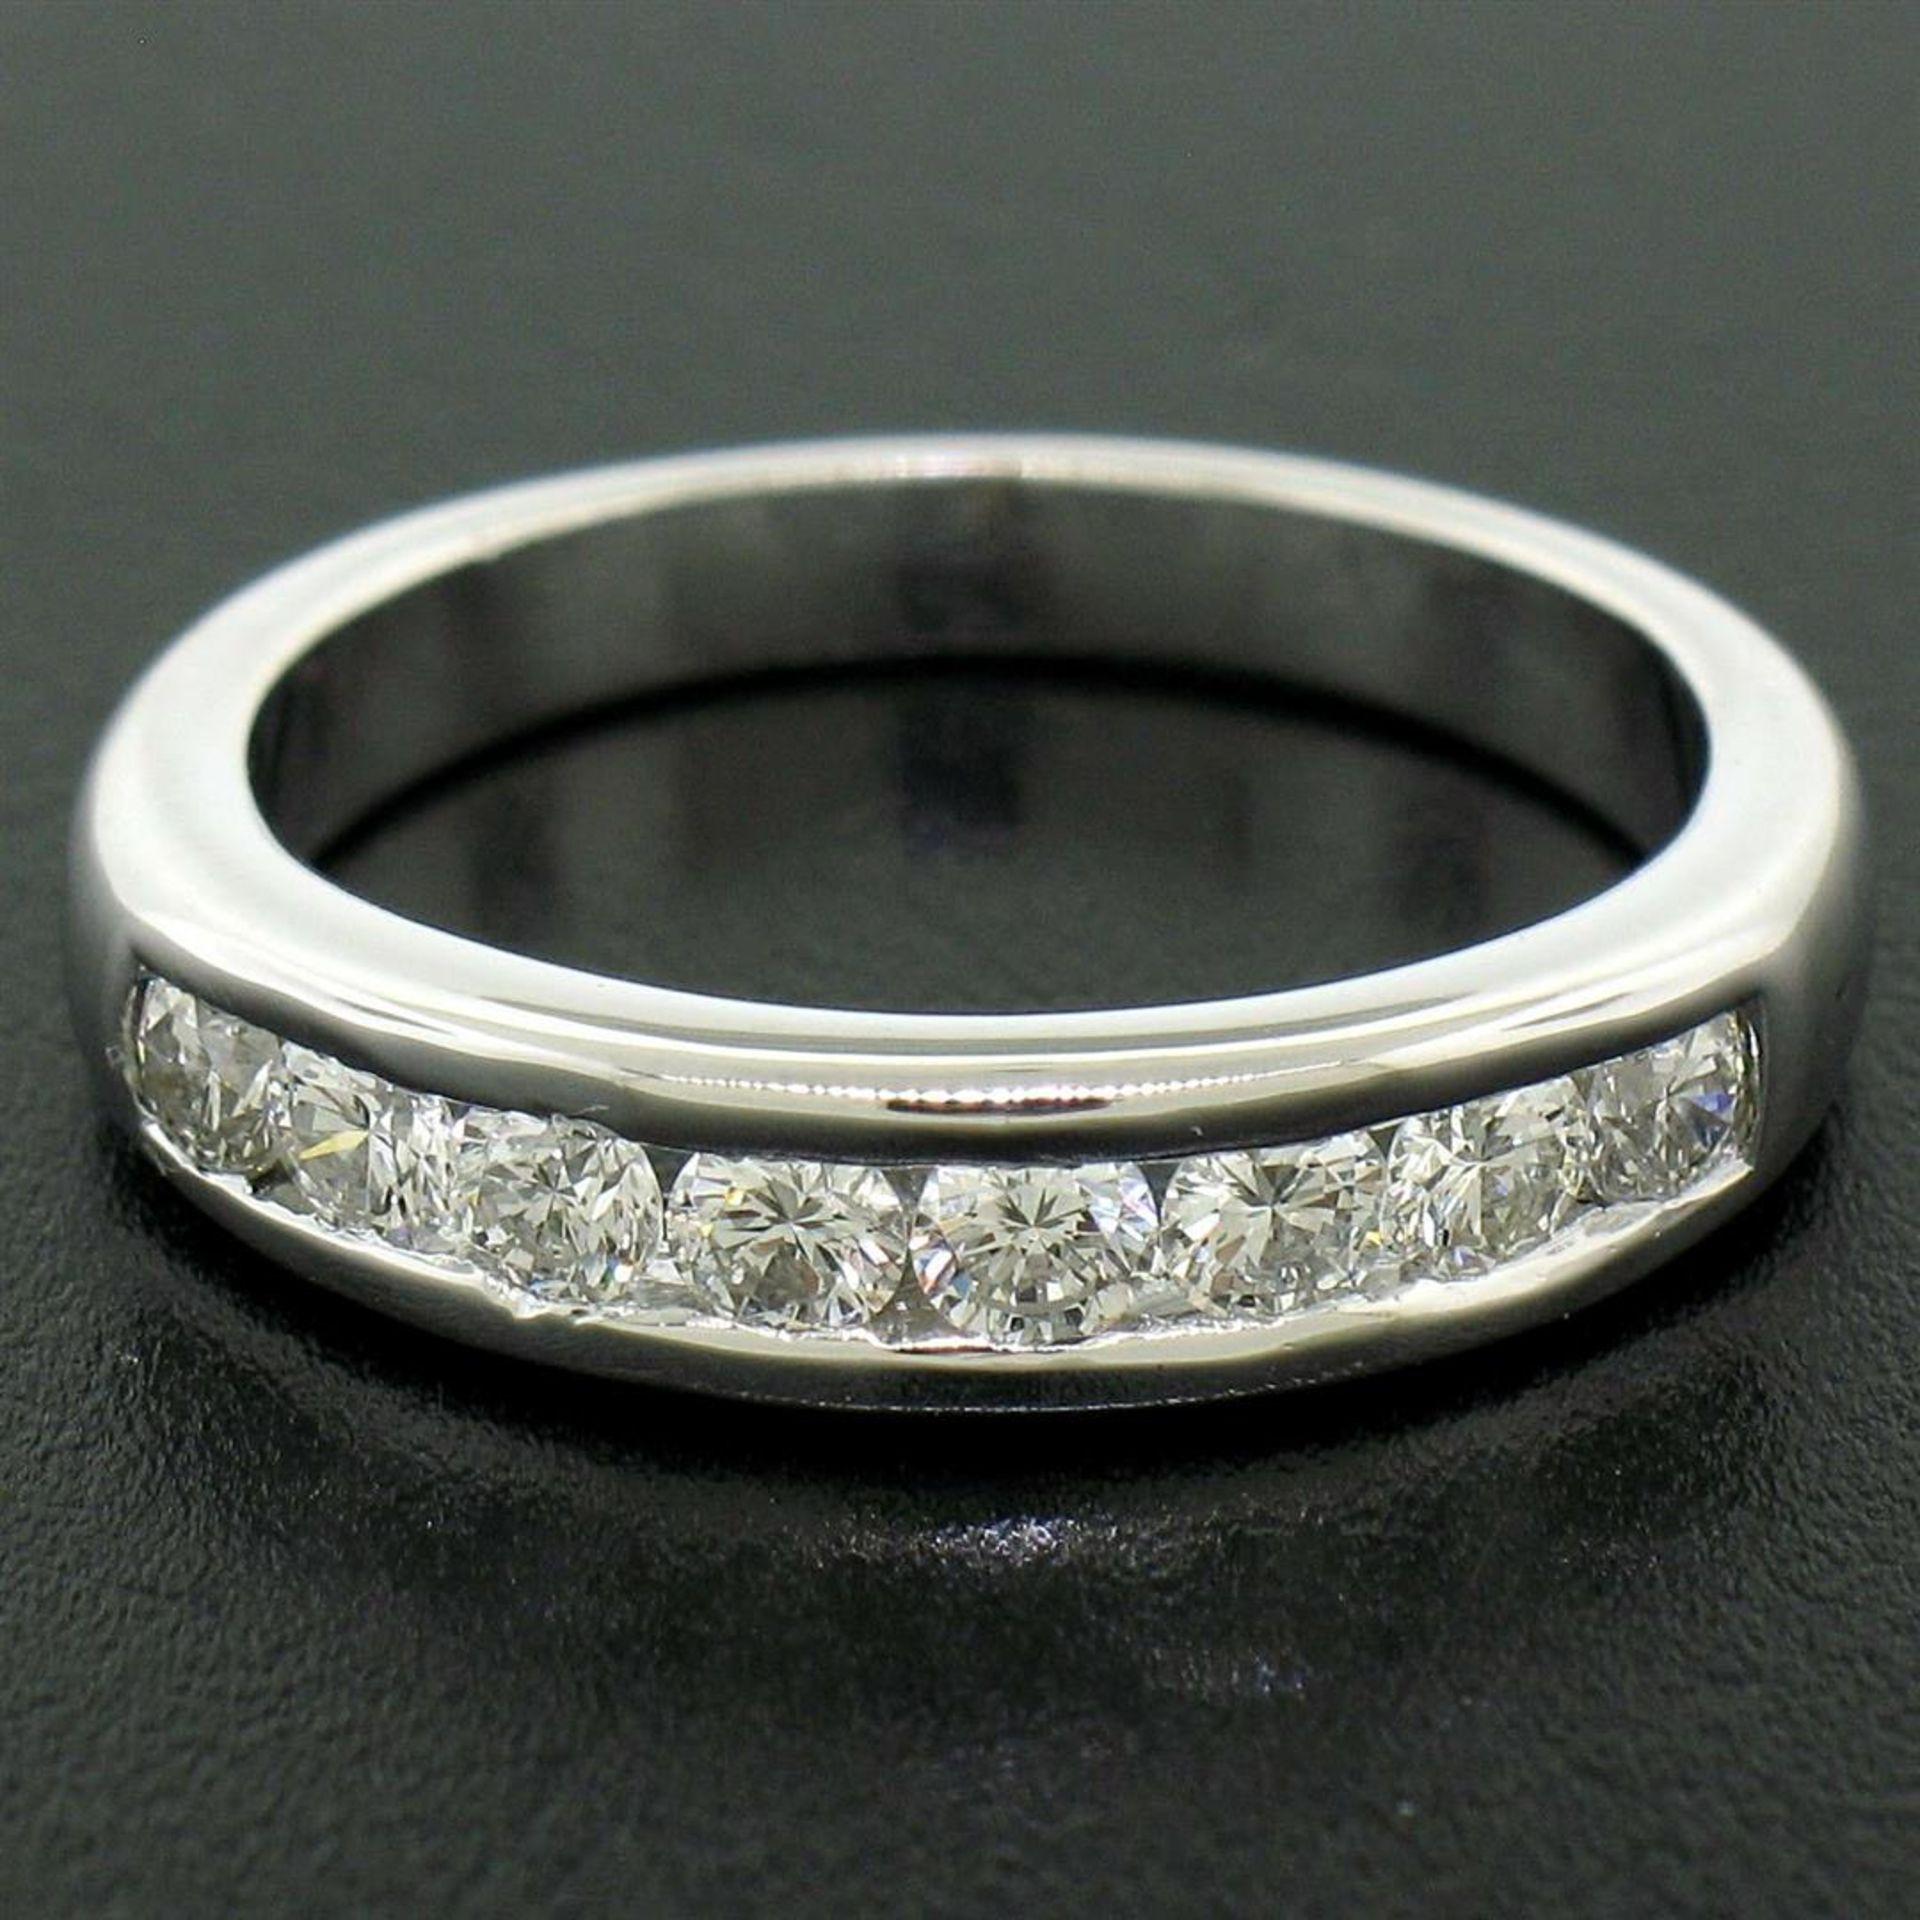 Classic Platinum .80ctw Channel Set Round Brilliant VS Diamond Wedding Band Ring - Image 3 of 8